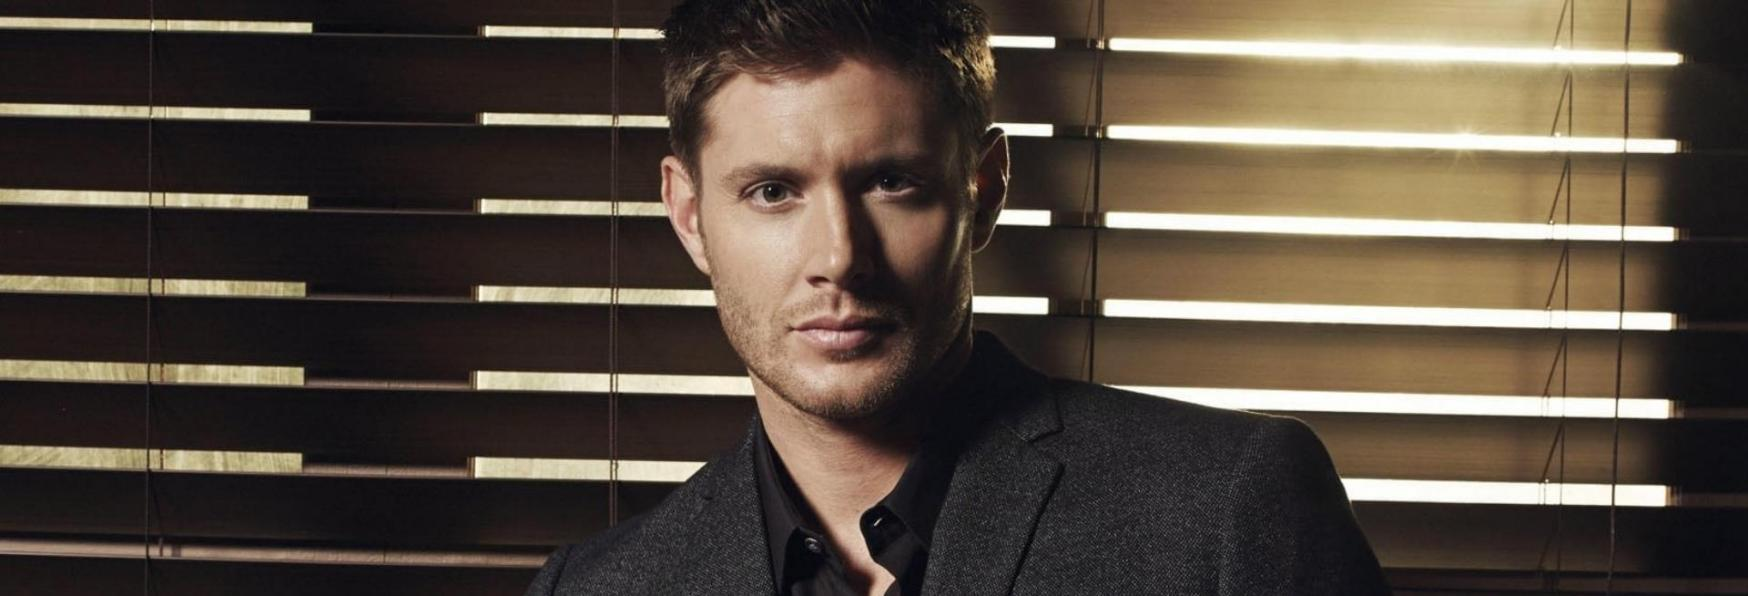 Jensen Ackles (Supernatural) svela il suo Bizzarro Look per The Boys 3